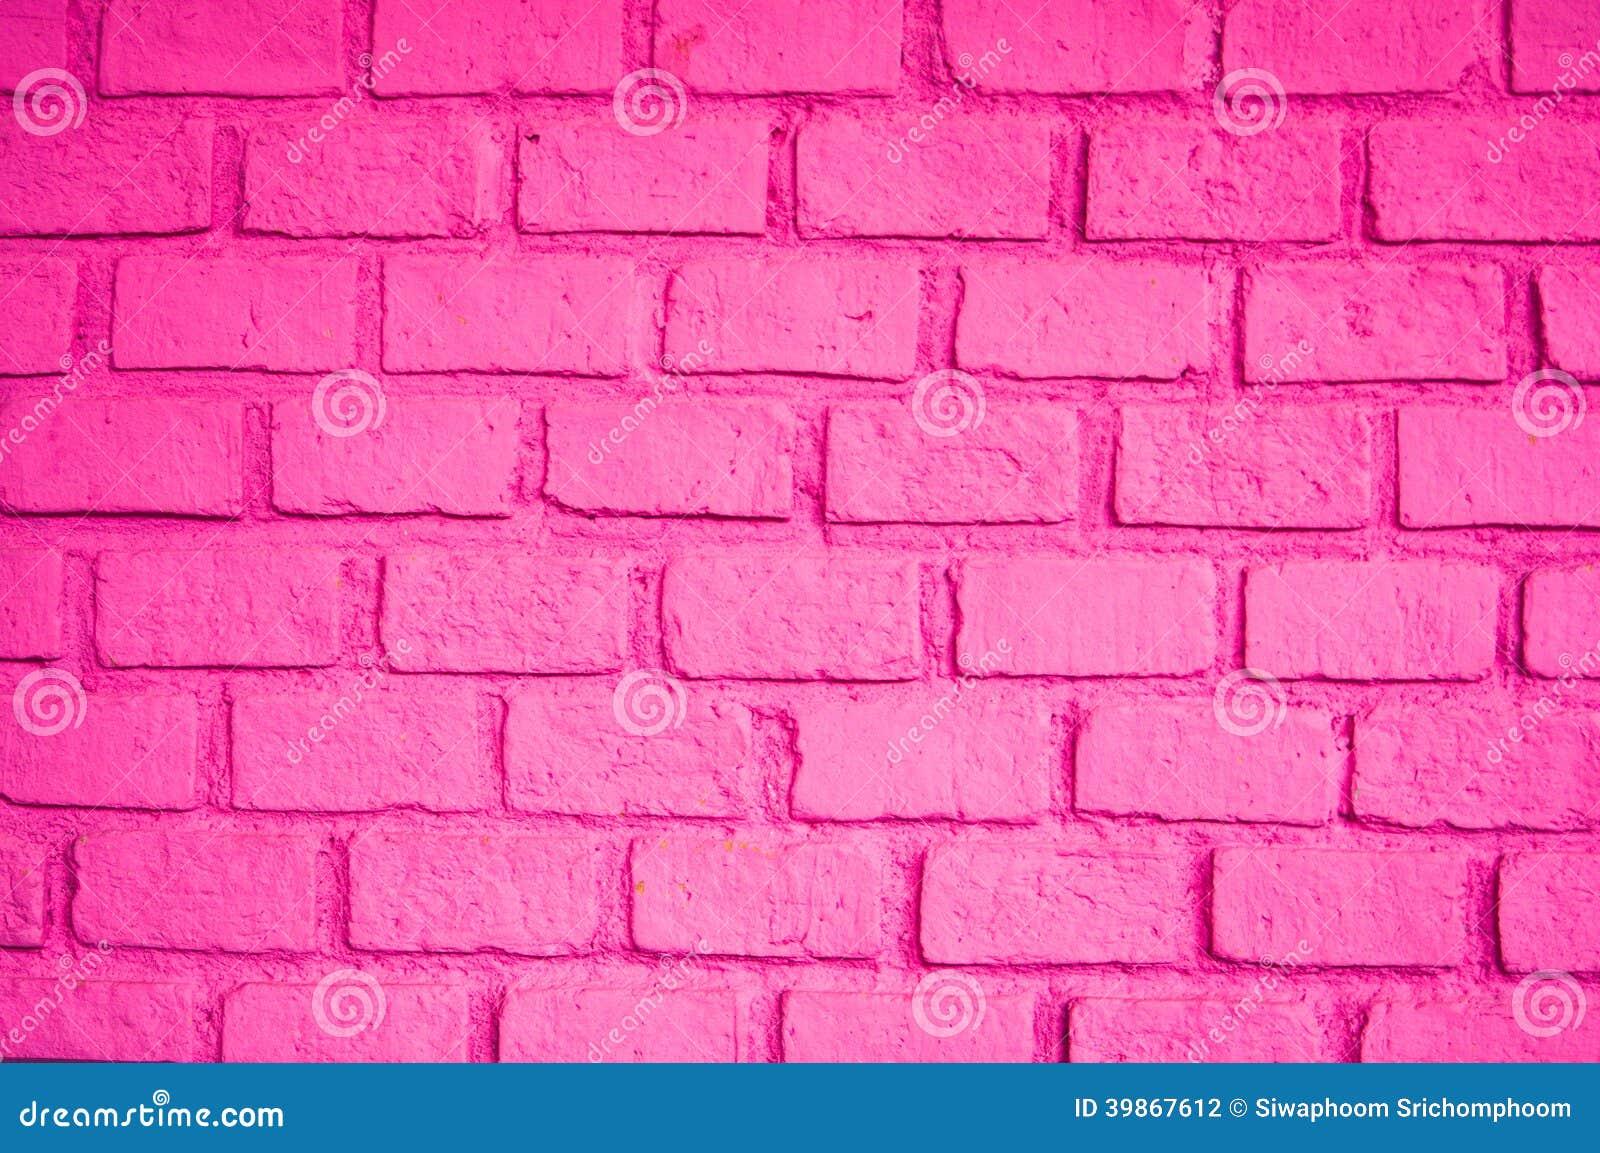 Beautiful Pink Color Of Brick Wall Stock Photo - Image: 39867612